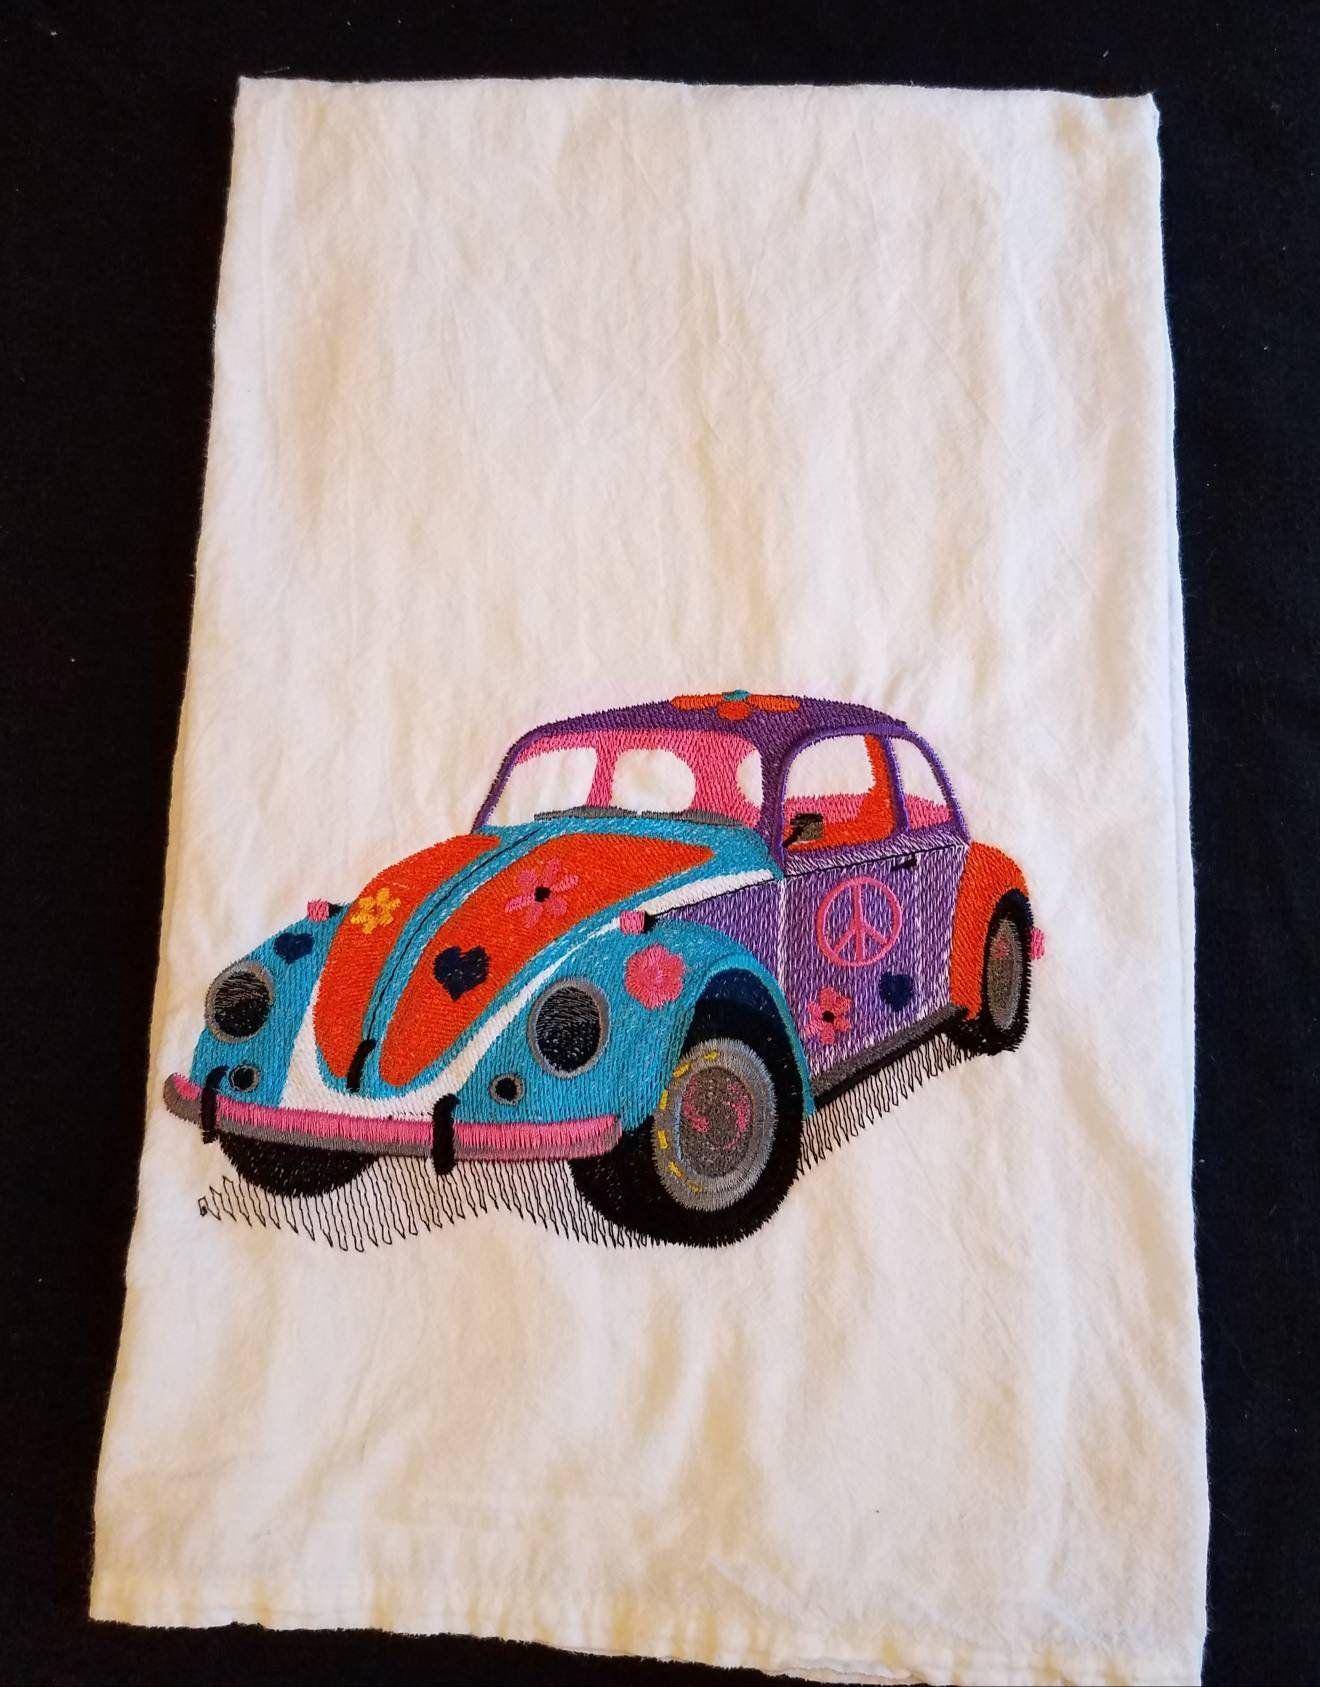 This Item Is Unavailable Flour Sack Towels Flour Sack Tea Towels Flour Sack Kitchen Towels